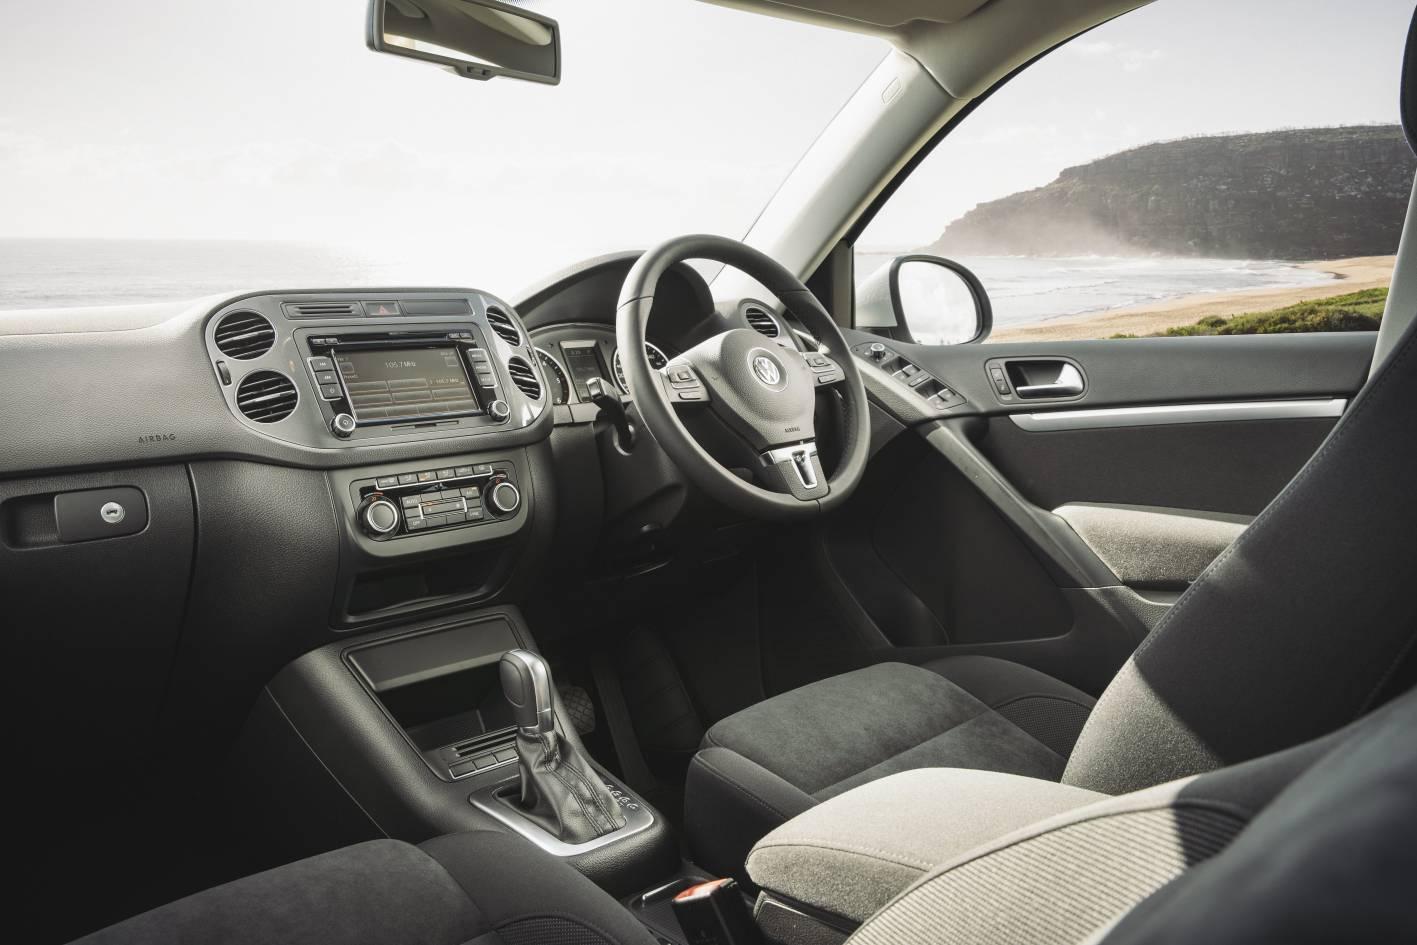 Hyundai Cars 2014 >> 2015 Volkswagen Tiguan on sale in Australia from $28,990 | PerformanceDrive